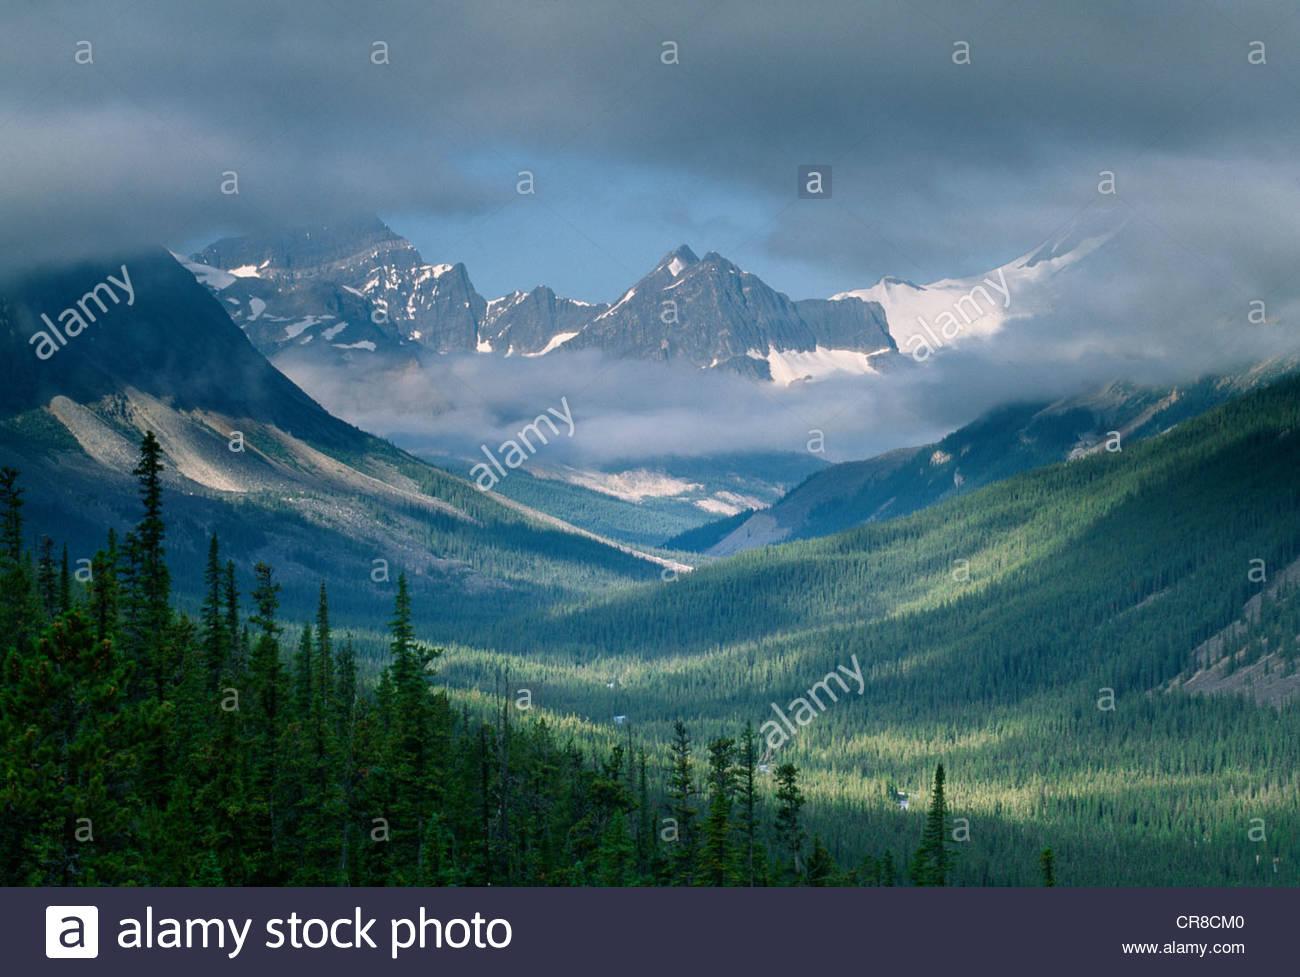 Canadian Rockies, Banff National Park, Alberta, Canada - Stock Image